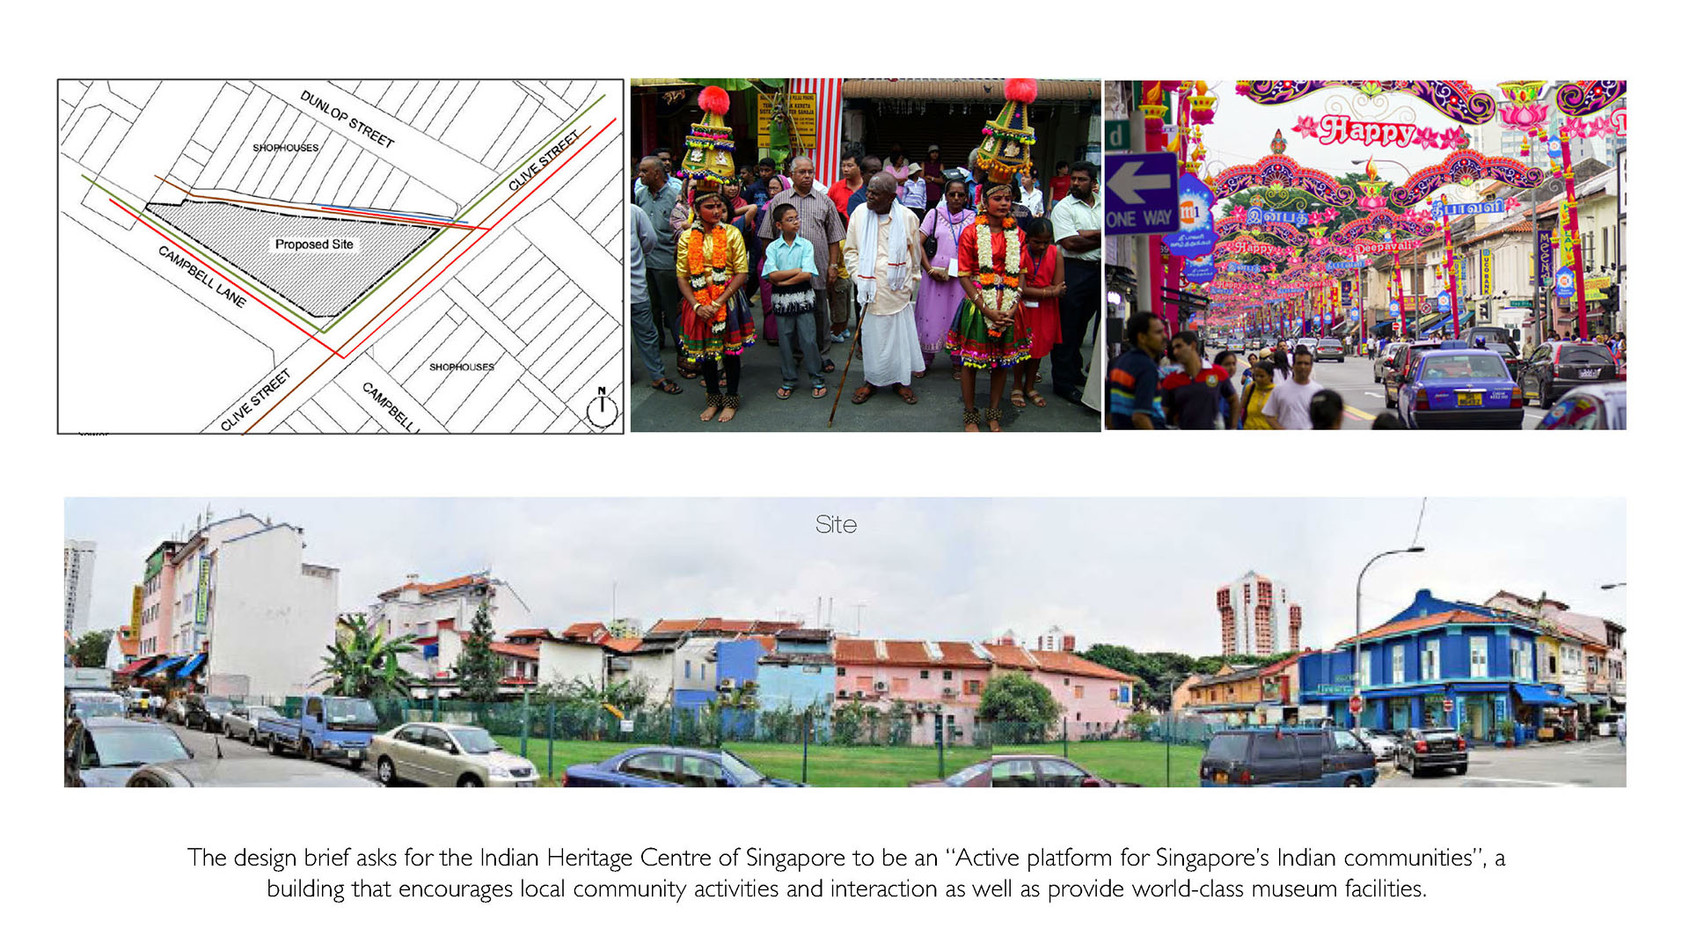 INDIAN-HERITAGE-CENTER-OF-SINGAPORE-EN 0